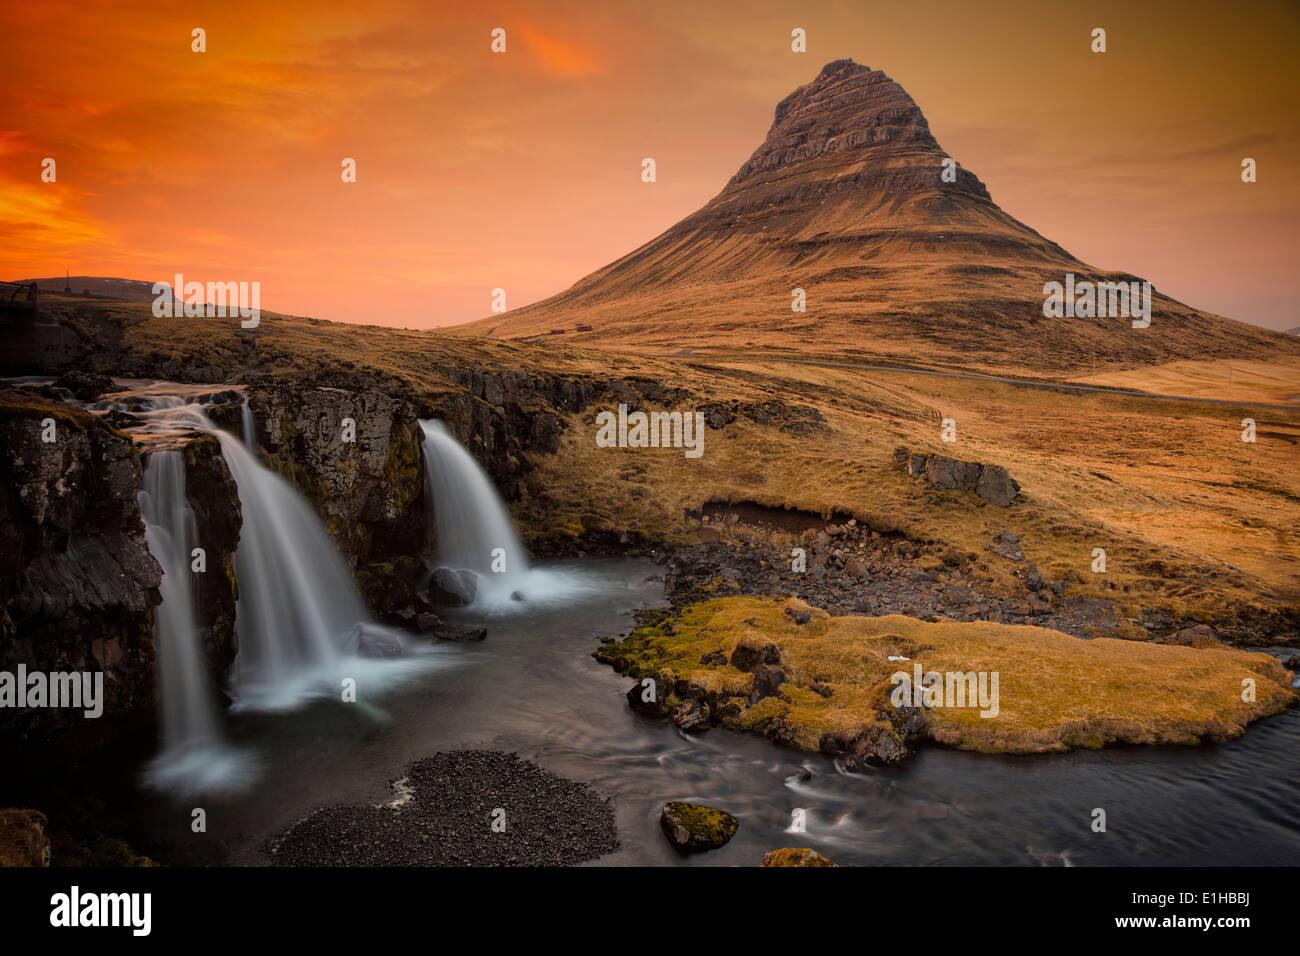 The Kirkjufell mountain and waterfall near Grundarfjordur at dusk, Snaefellsnes Peninsula, in western Iceland. - Stock Image